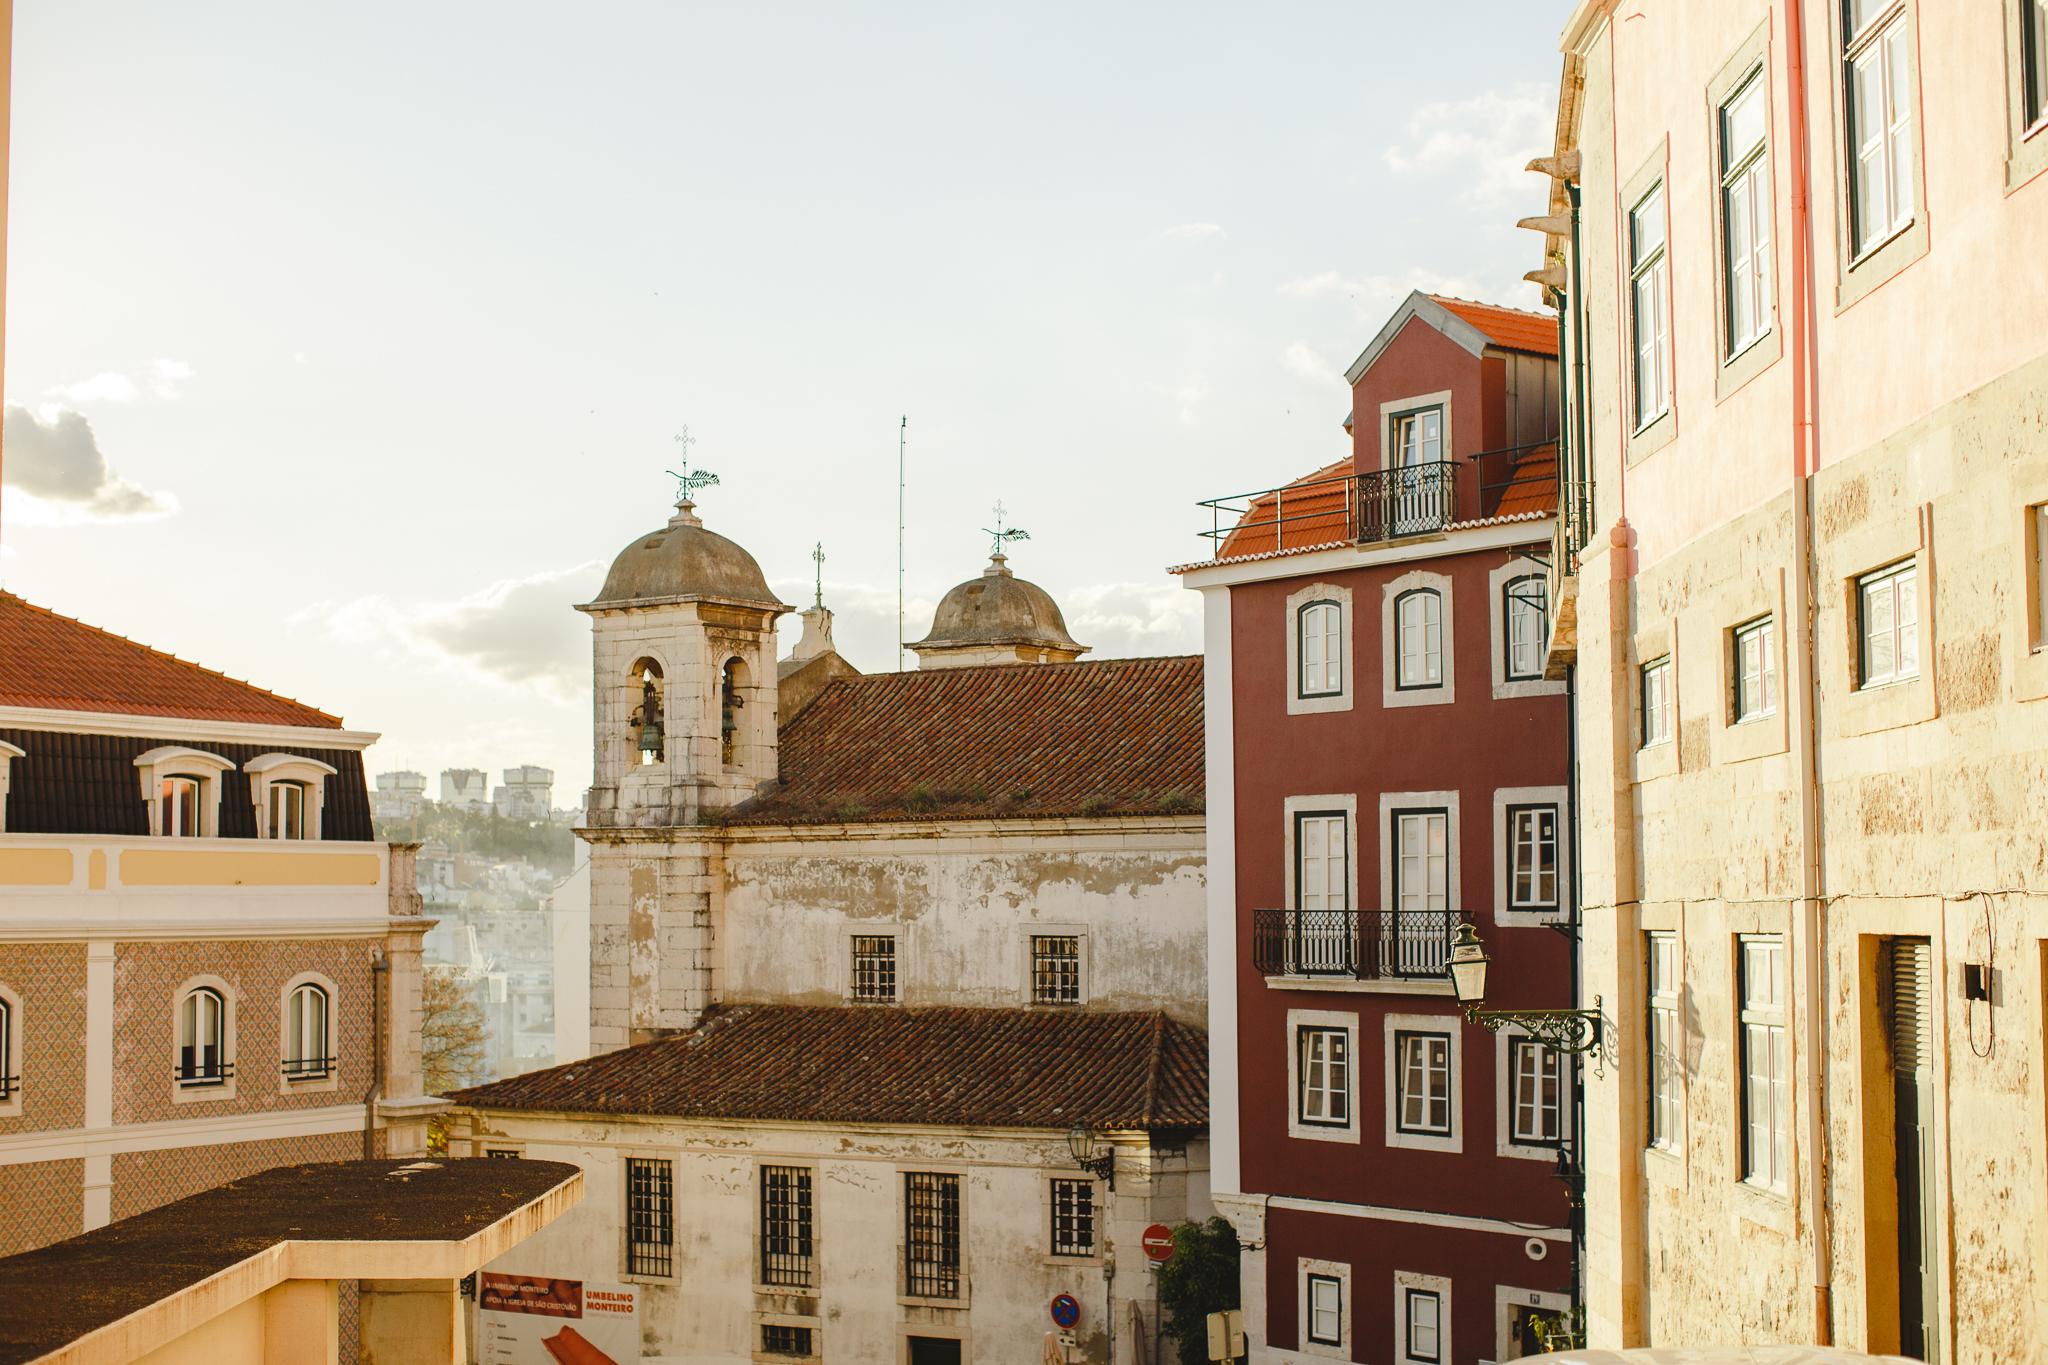 Engagement Shoot in Lisbon, Sessão de Namoro em Lisboa por Hello Twiggs